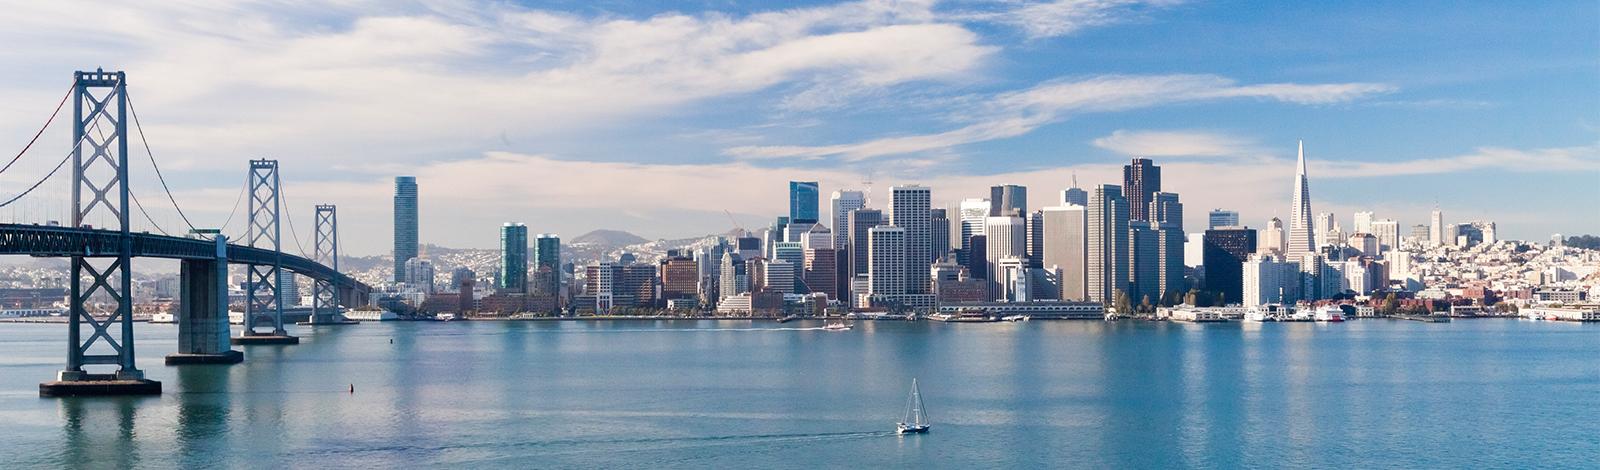 Downtown San Francisco Skyline photo